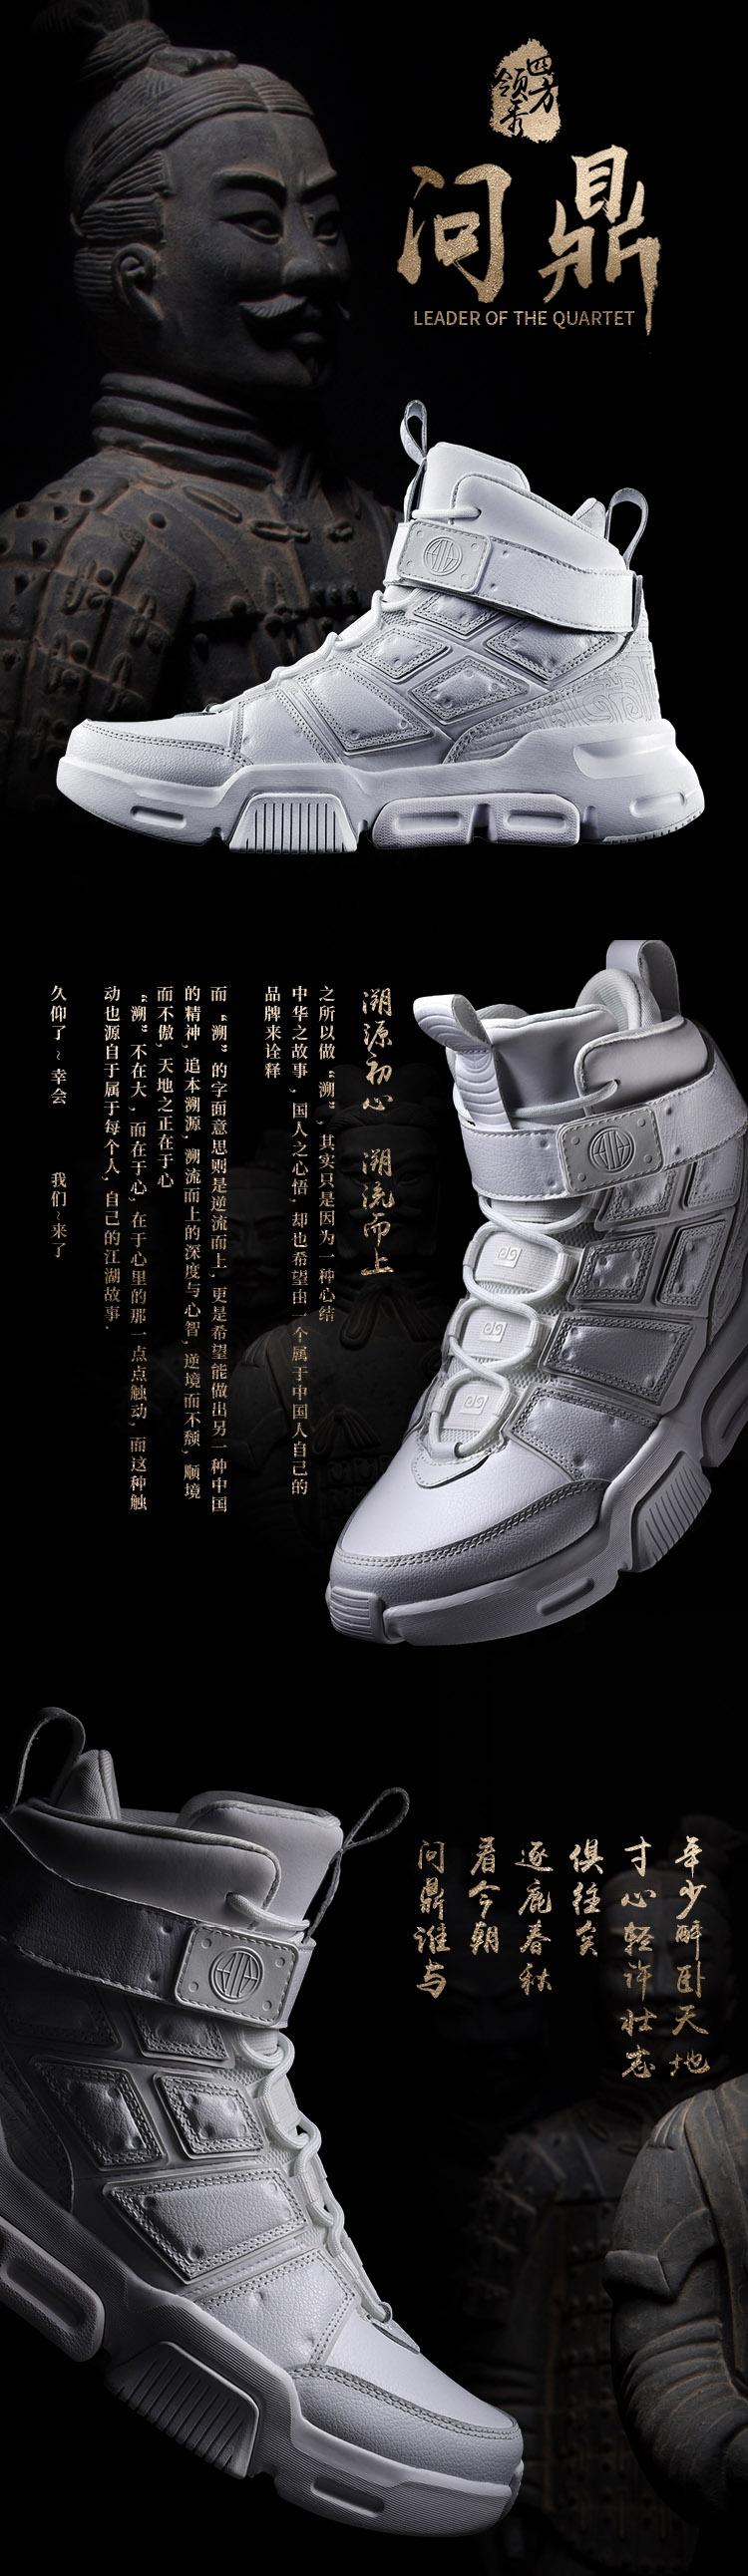 "Li-Ning 2018 Fall Men's Fashion Basketball Culture Shoes - ""Leader of the Quartet"""